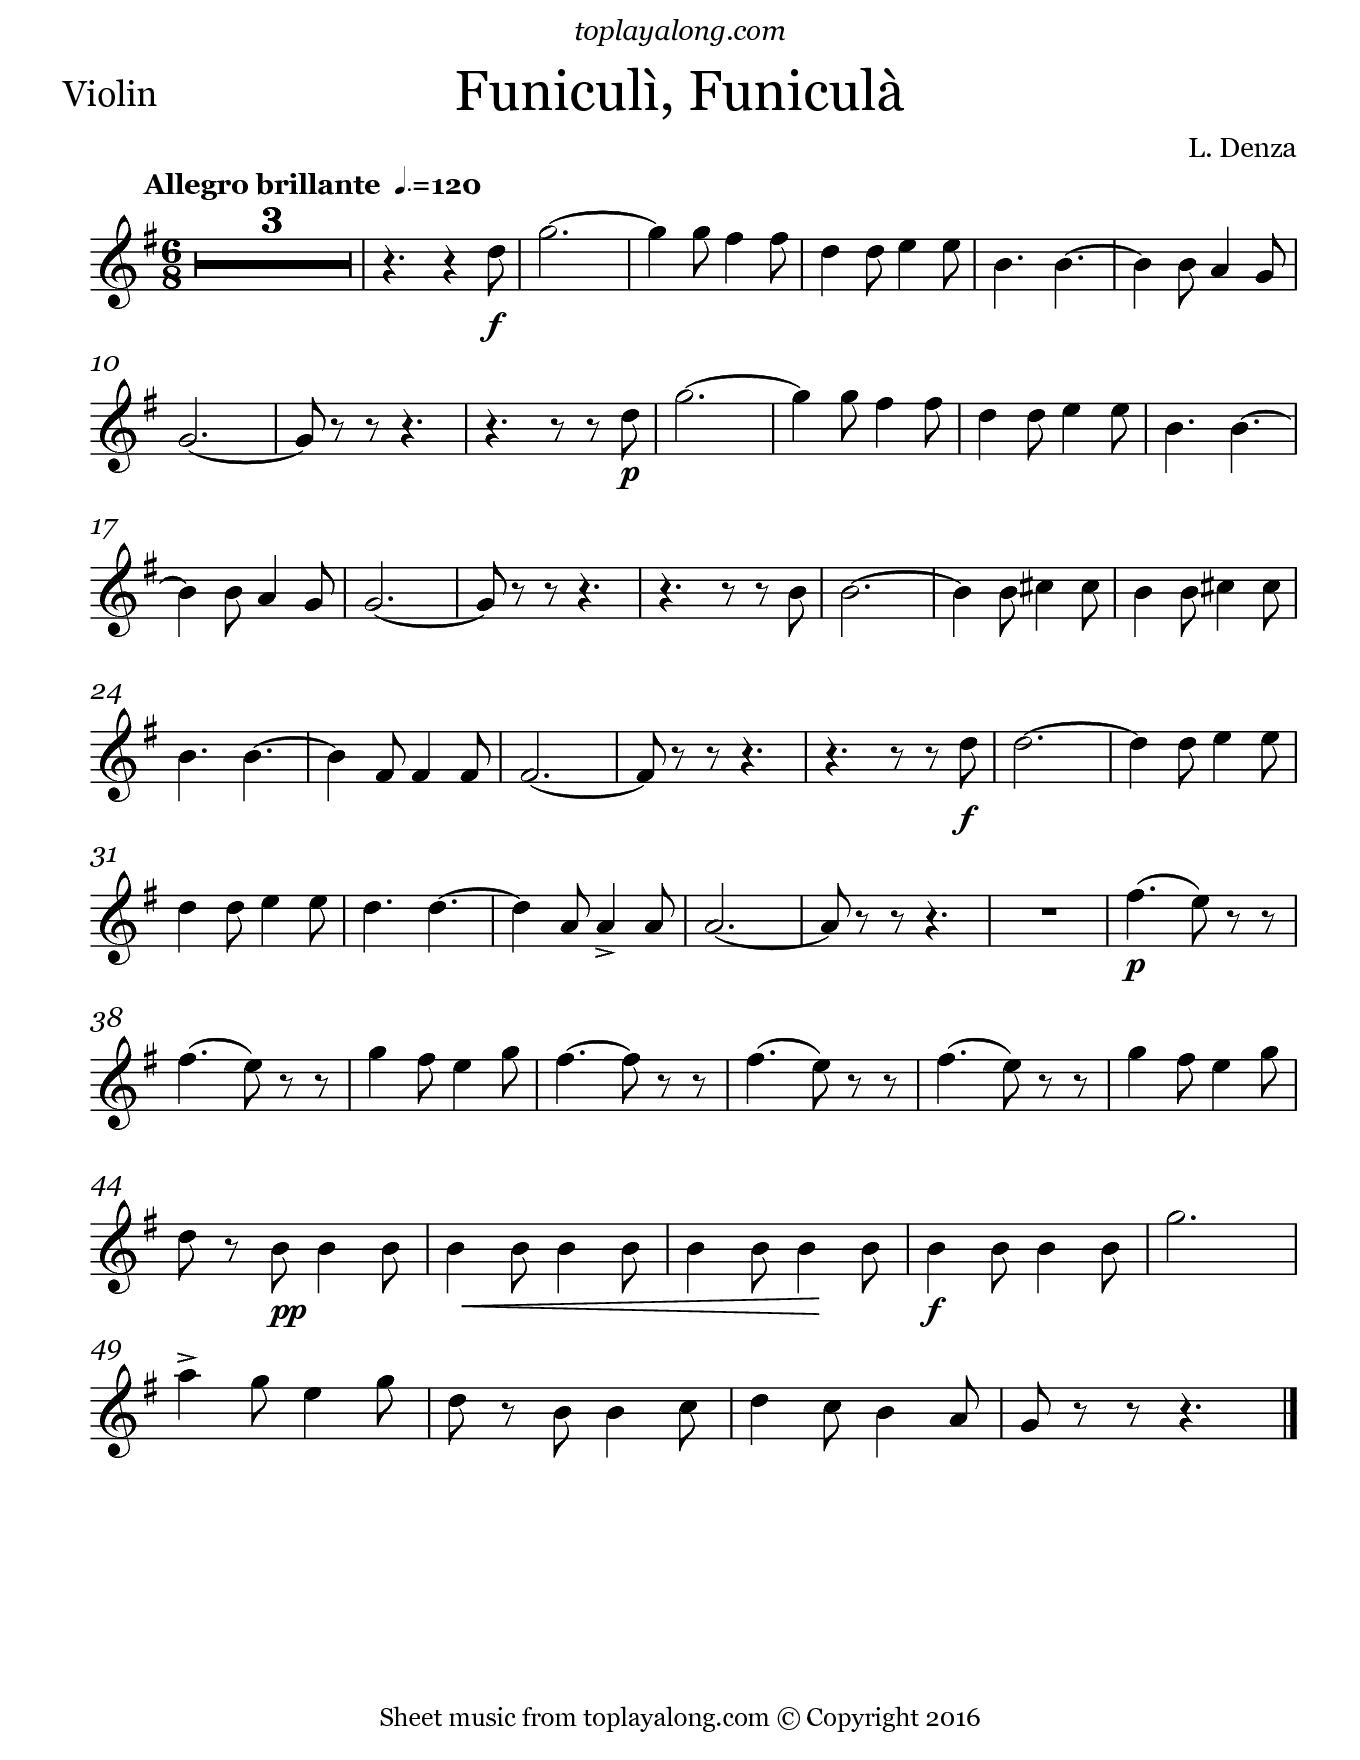 Funiculì, Funiculà by Denza. Sheet music for Violin, page 1.